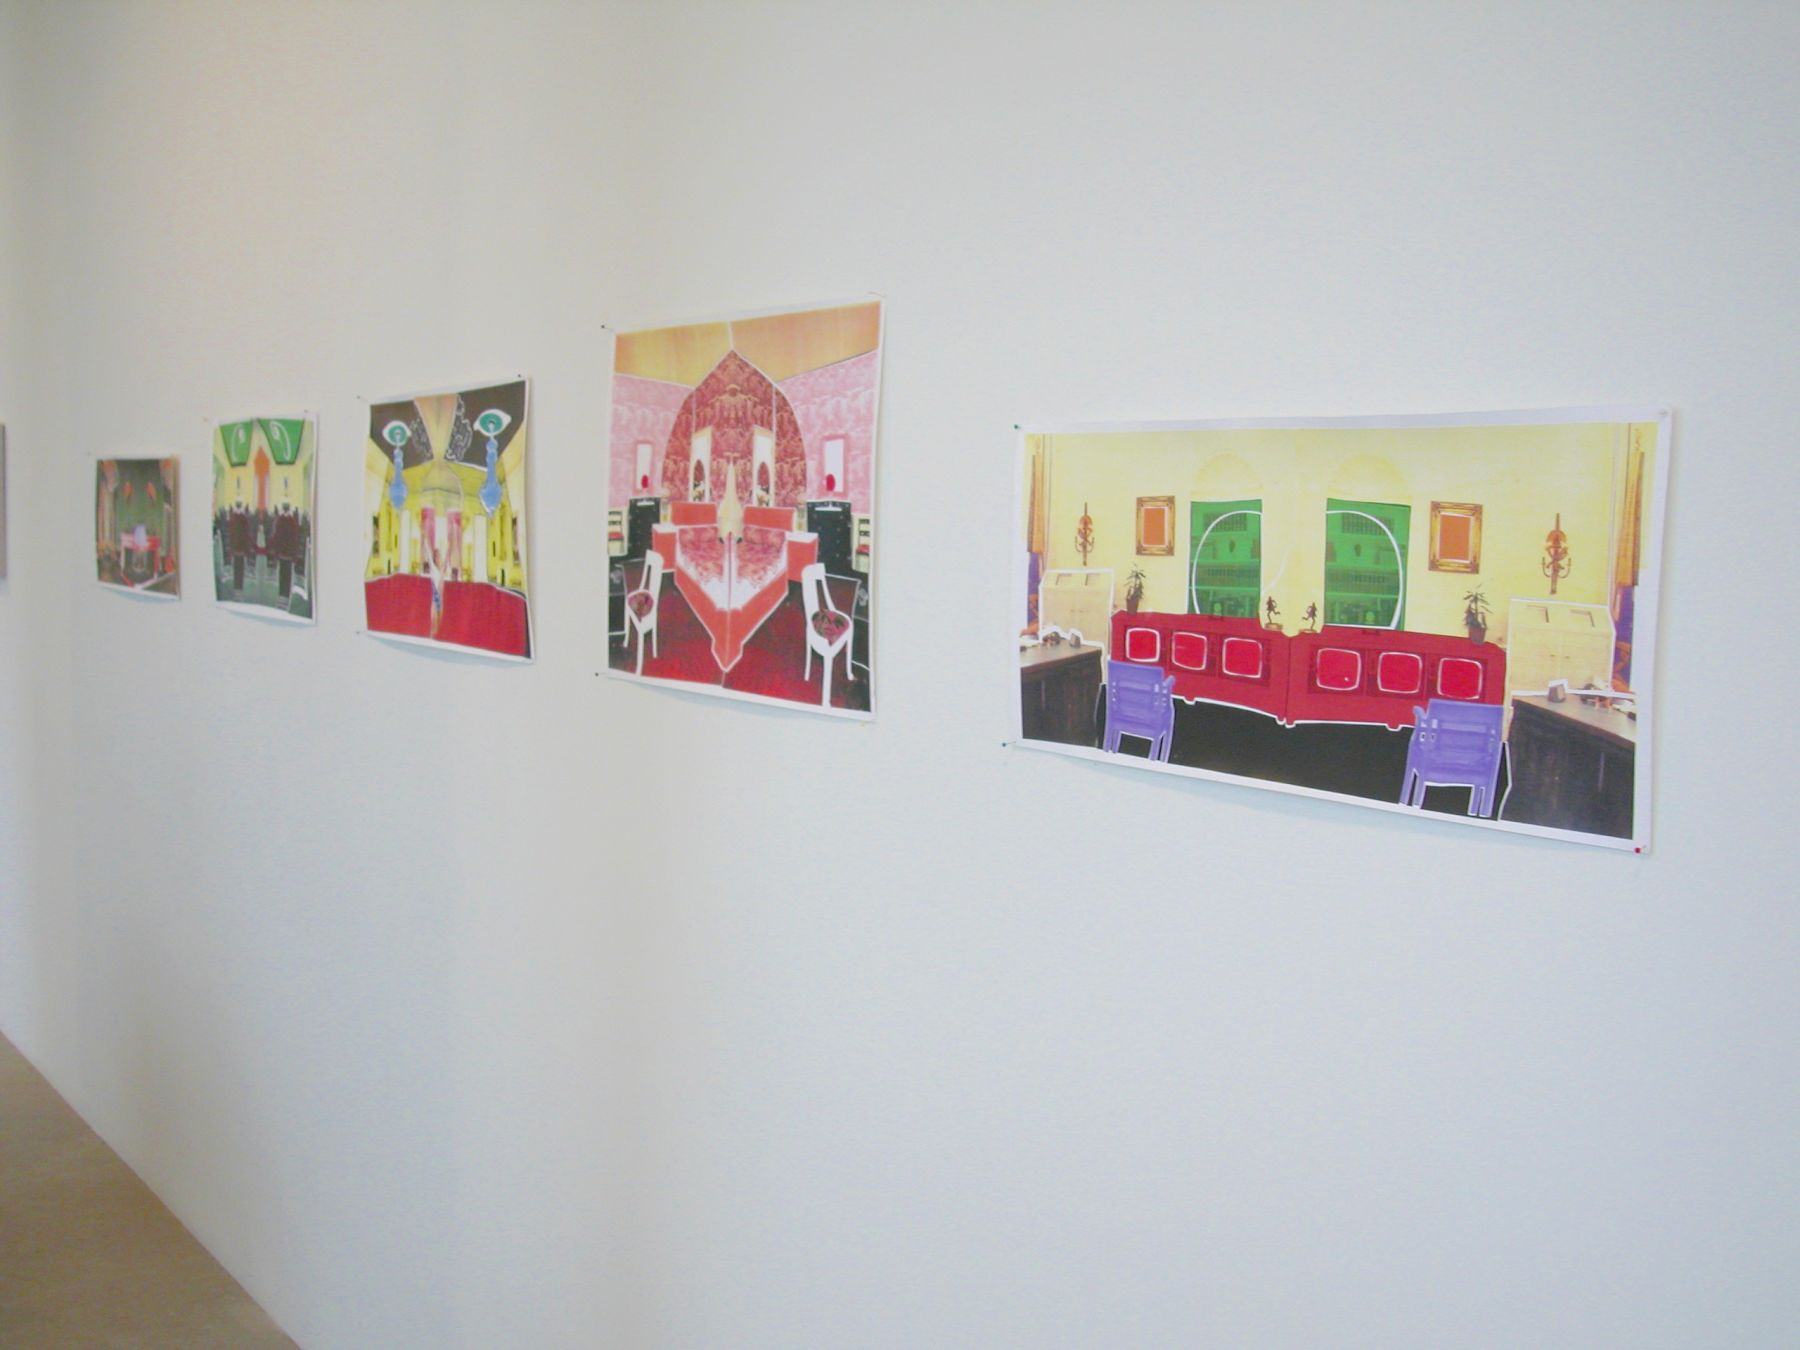 Installation view, Regarding Amy,  Greene Naftali, New York, 2003